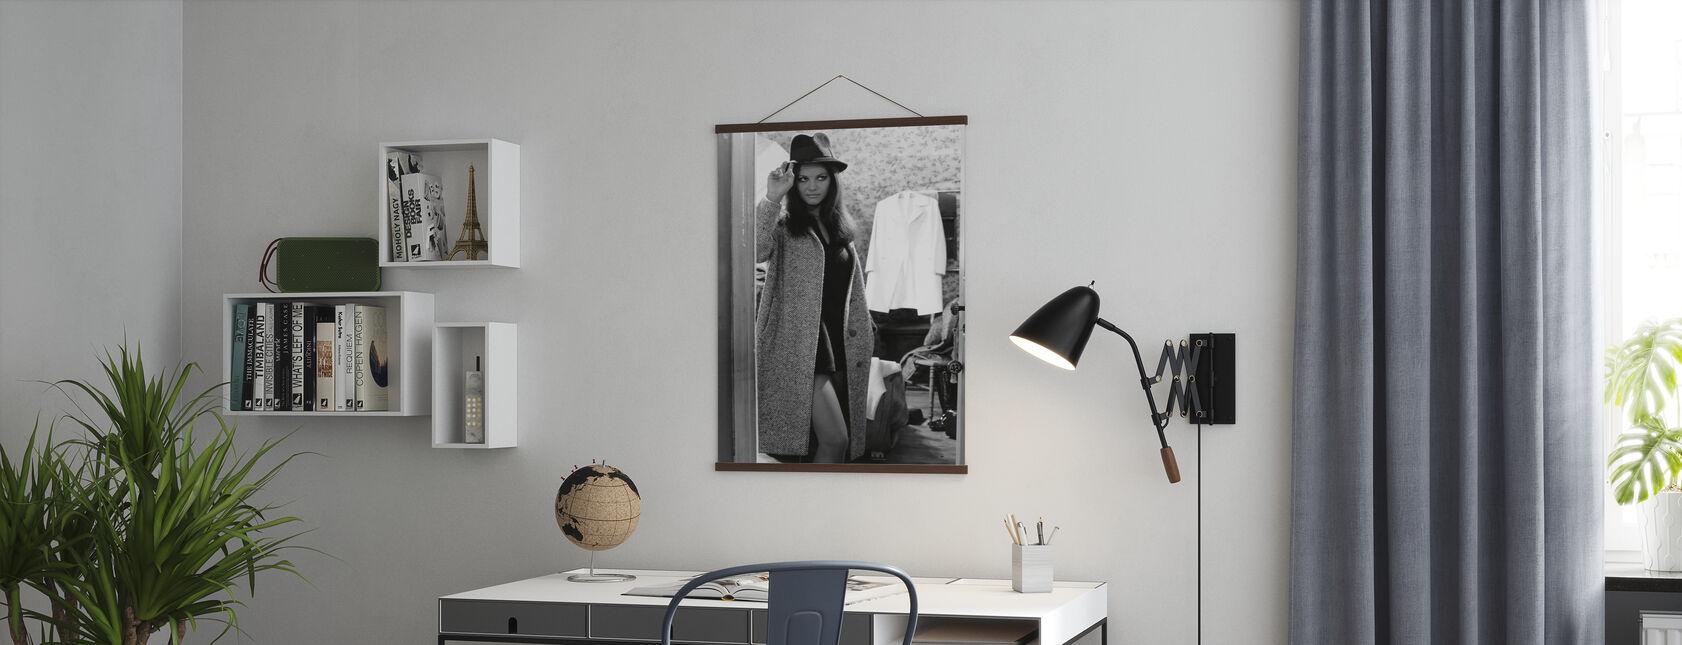 Fine Pair - Claudia Cardinale - Poster - Office